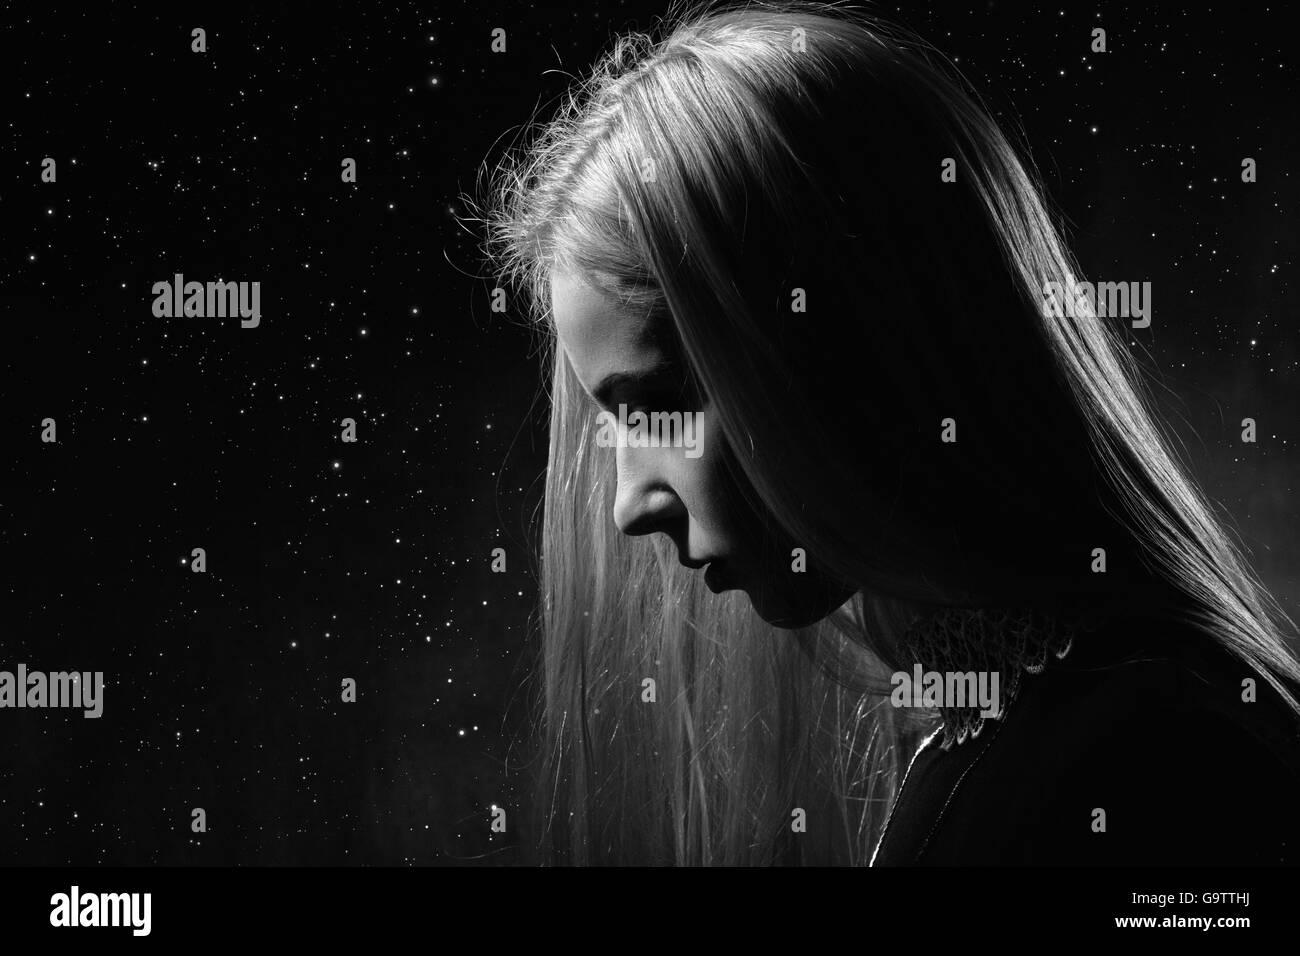 sad pensive girl profile on stars sky background, monochrome image - Stock Image